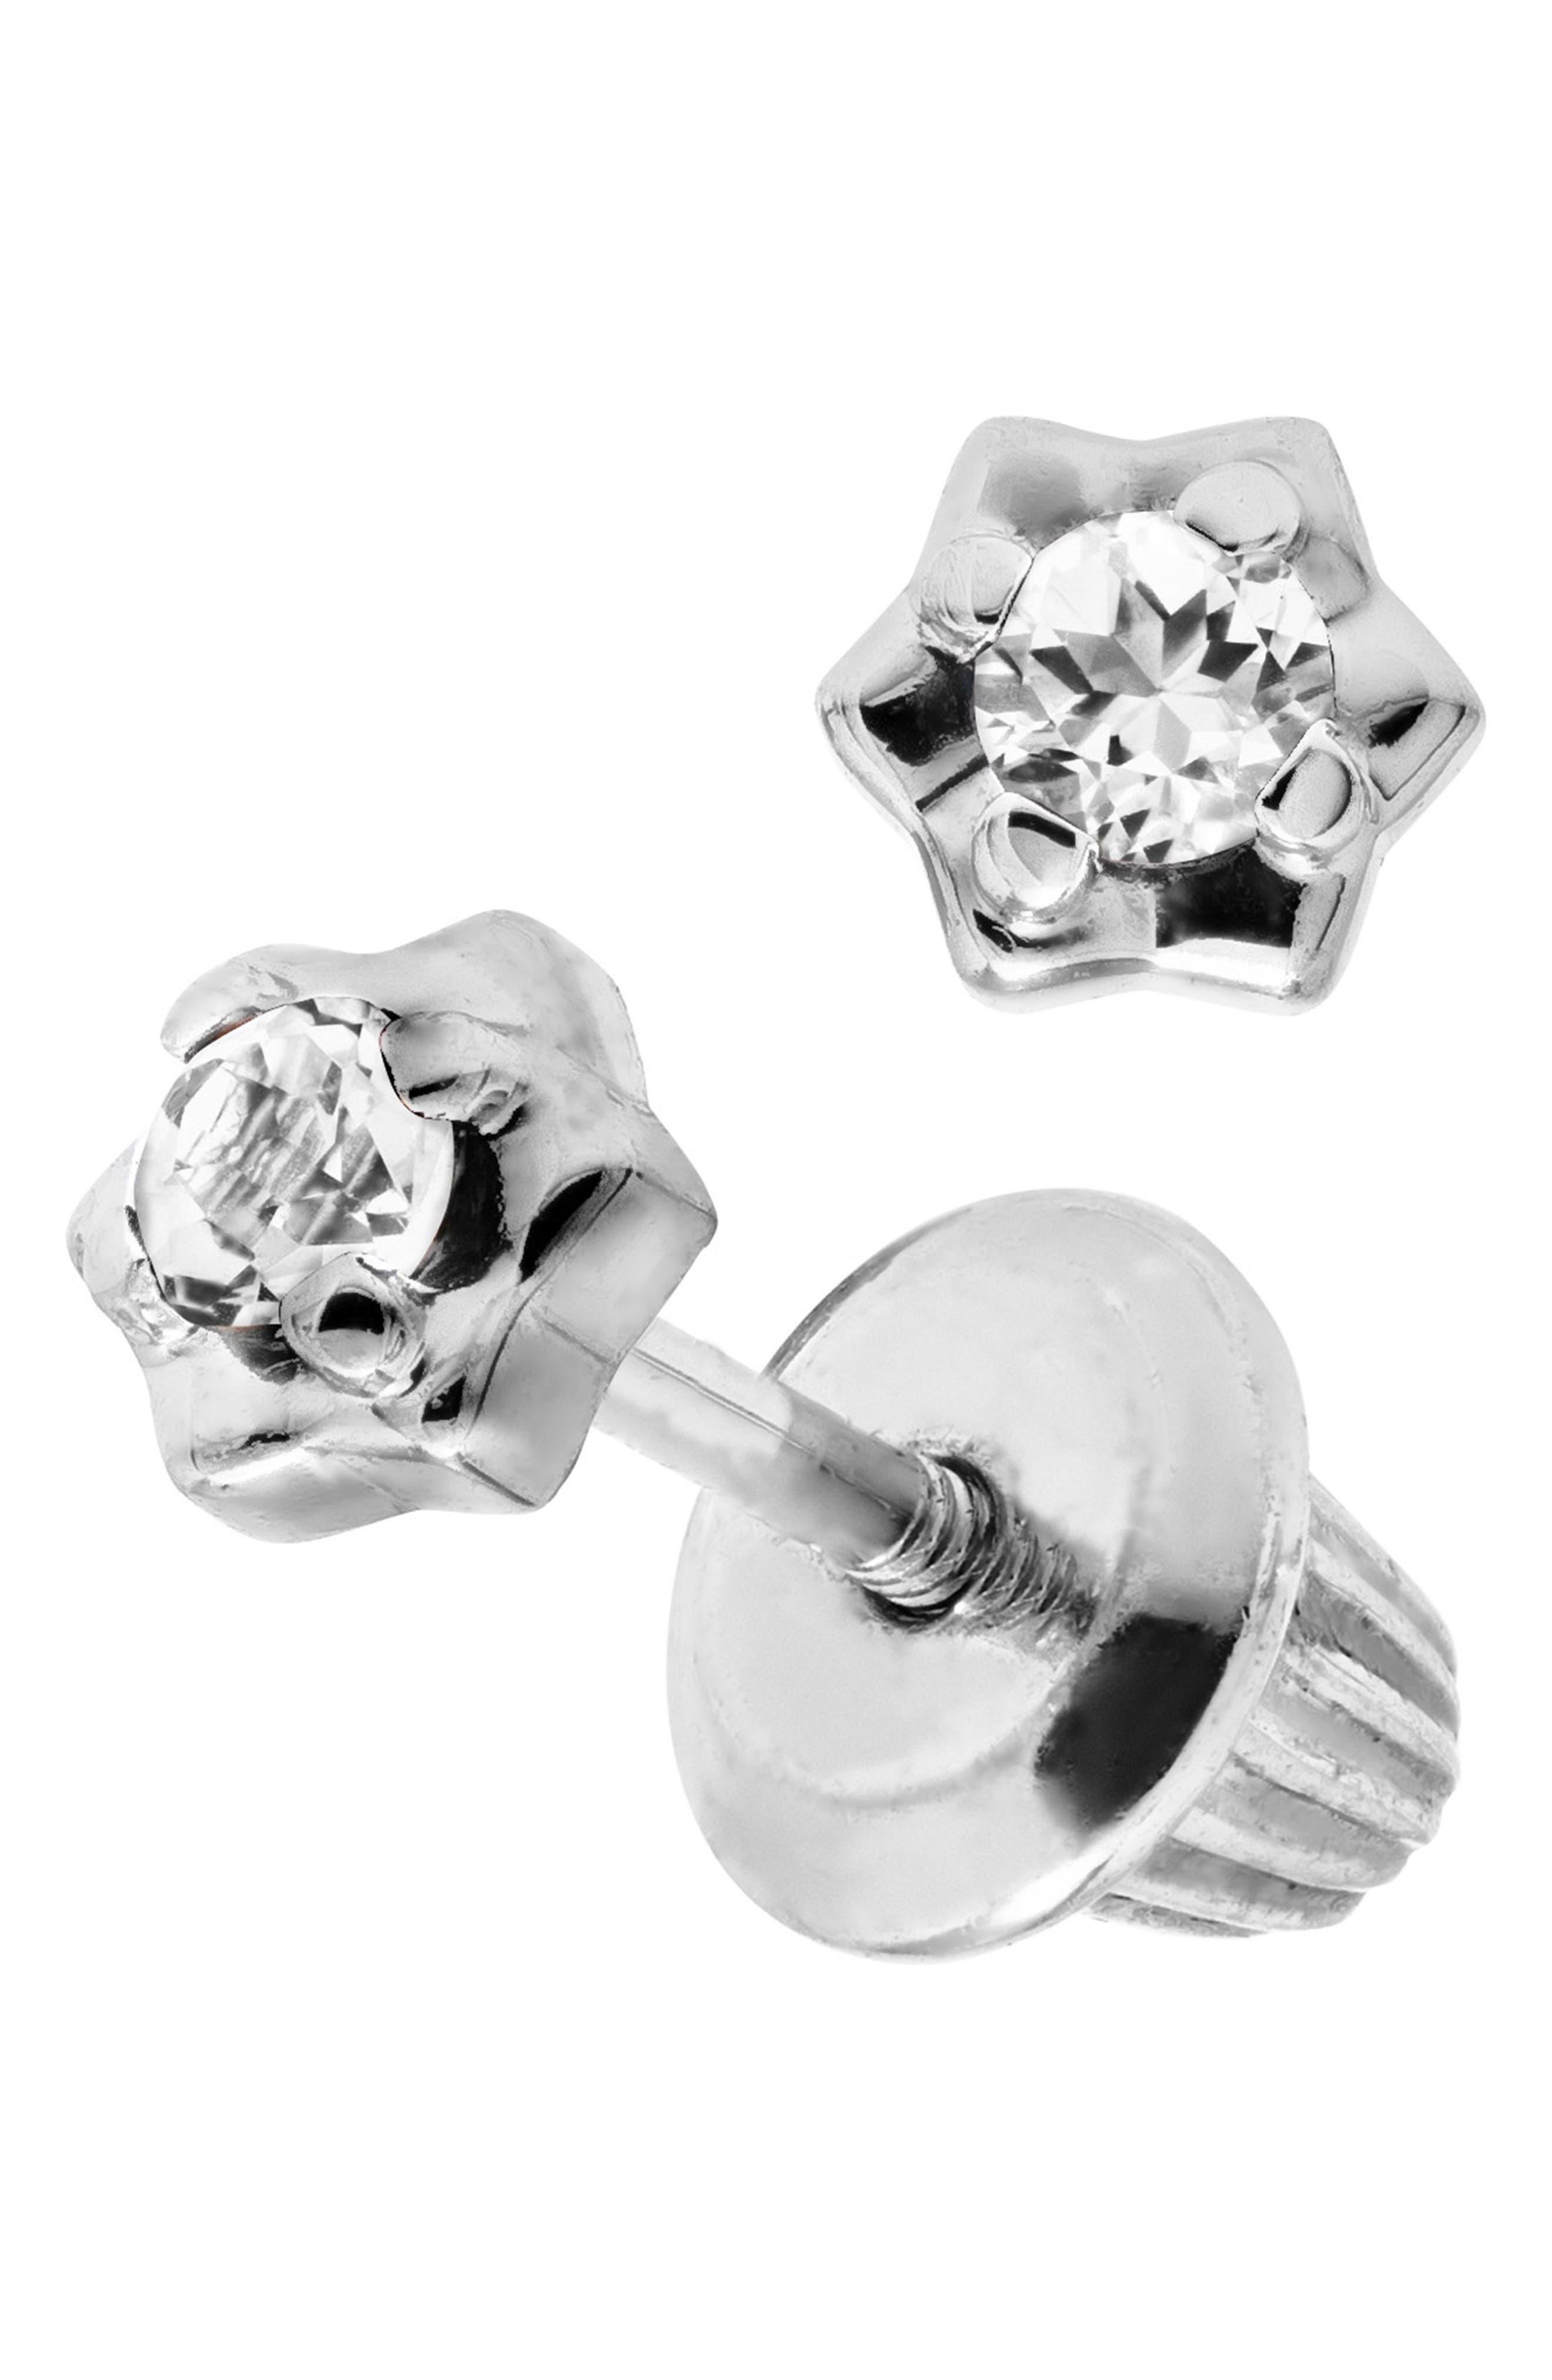 Sterling Silver & Diamond Stud Earrings,                             Main thumbnail 1, color,                             Silver